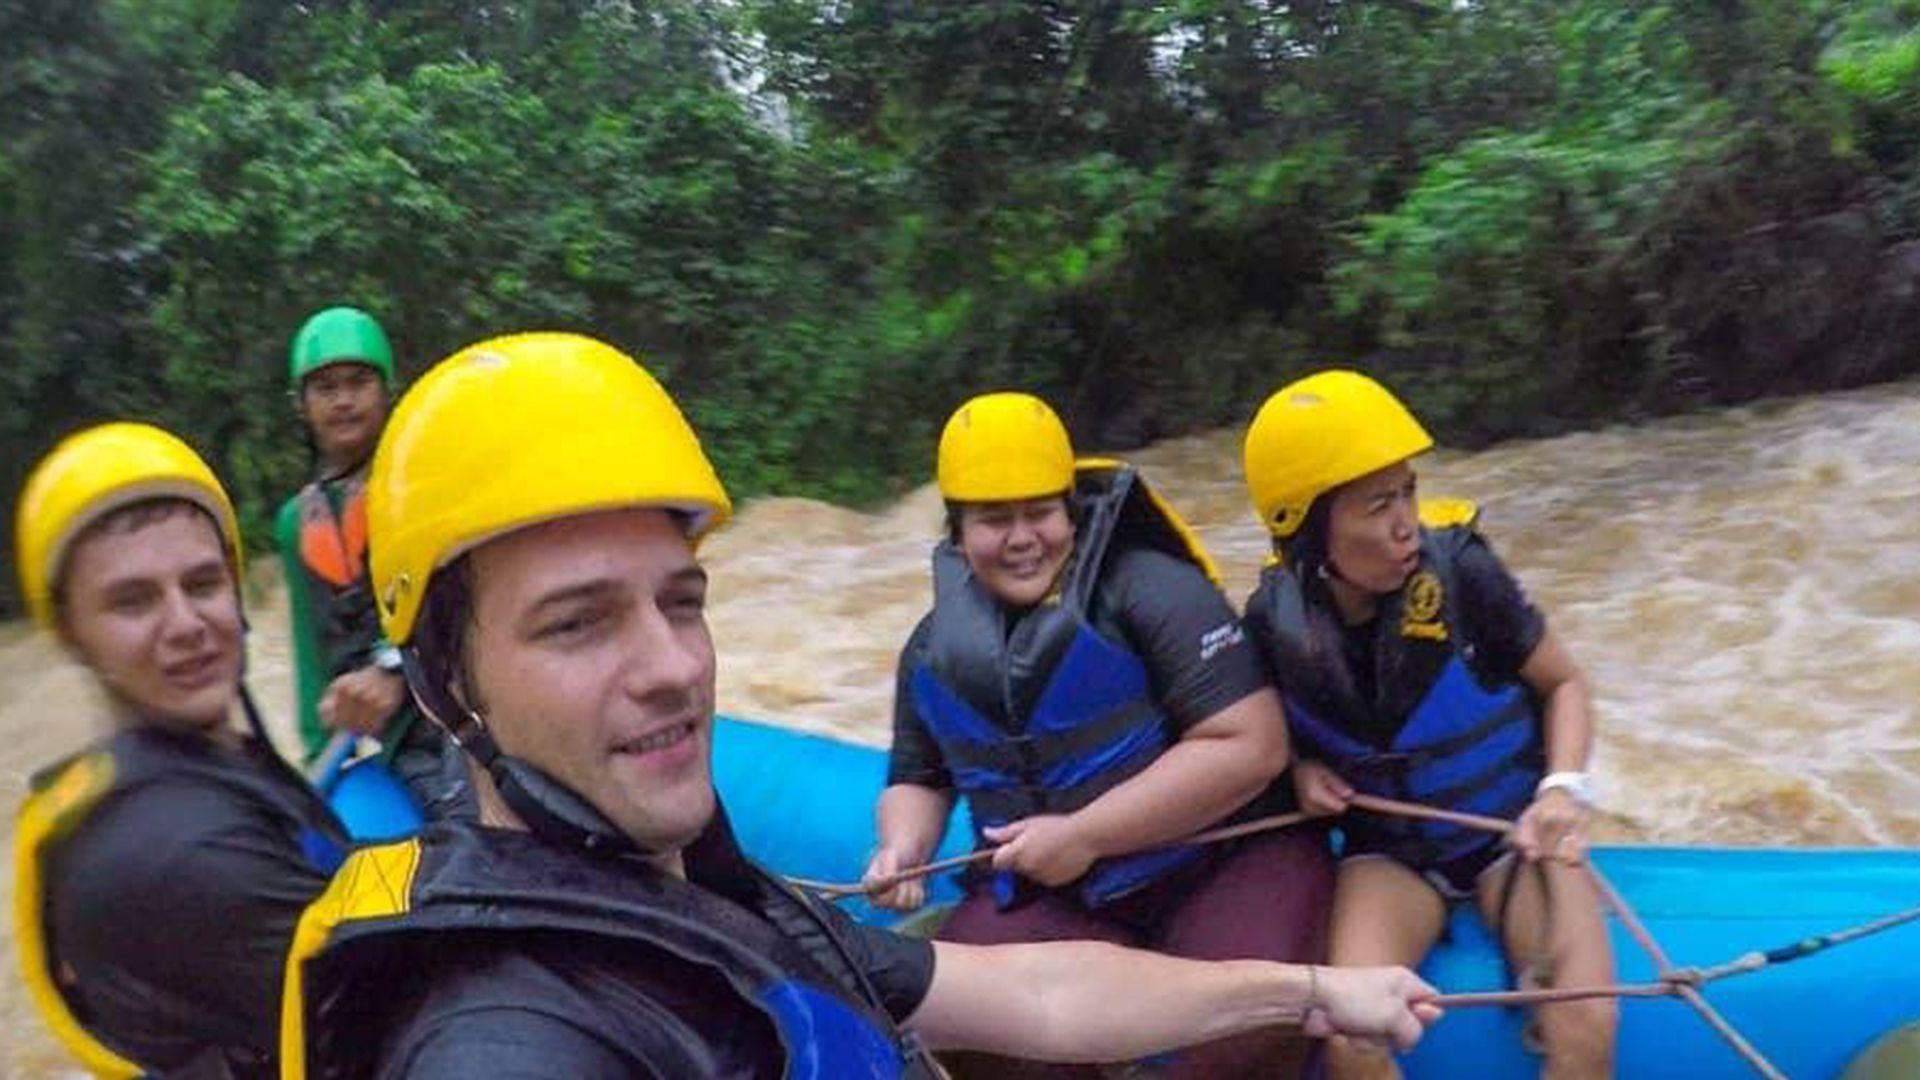 Phuket :4 in 1 Fun Activities- Rafting, Quad bike, Zip line, Temple